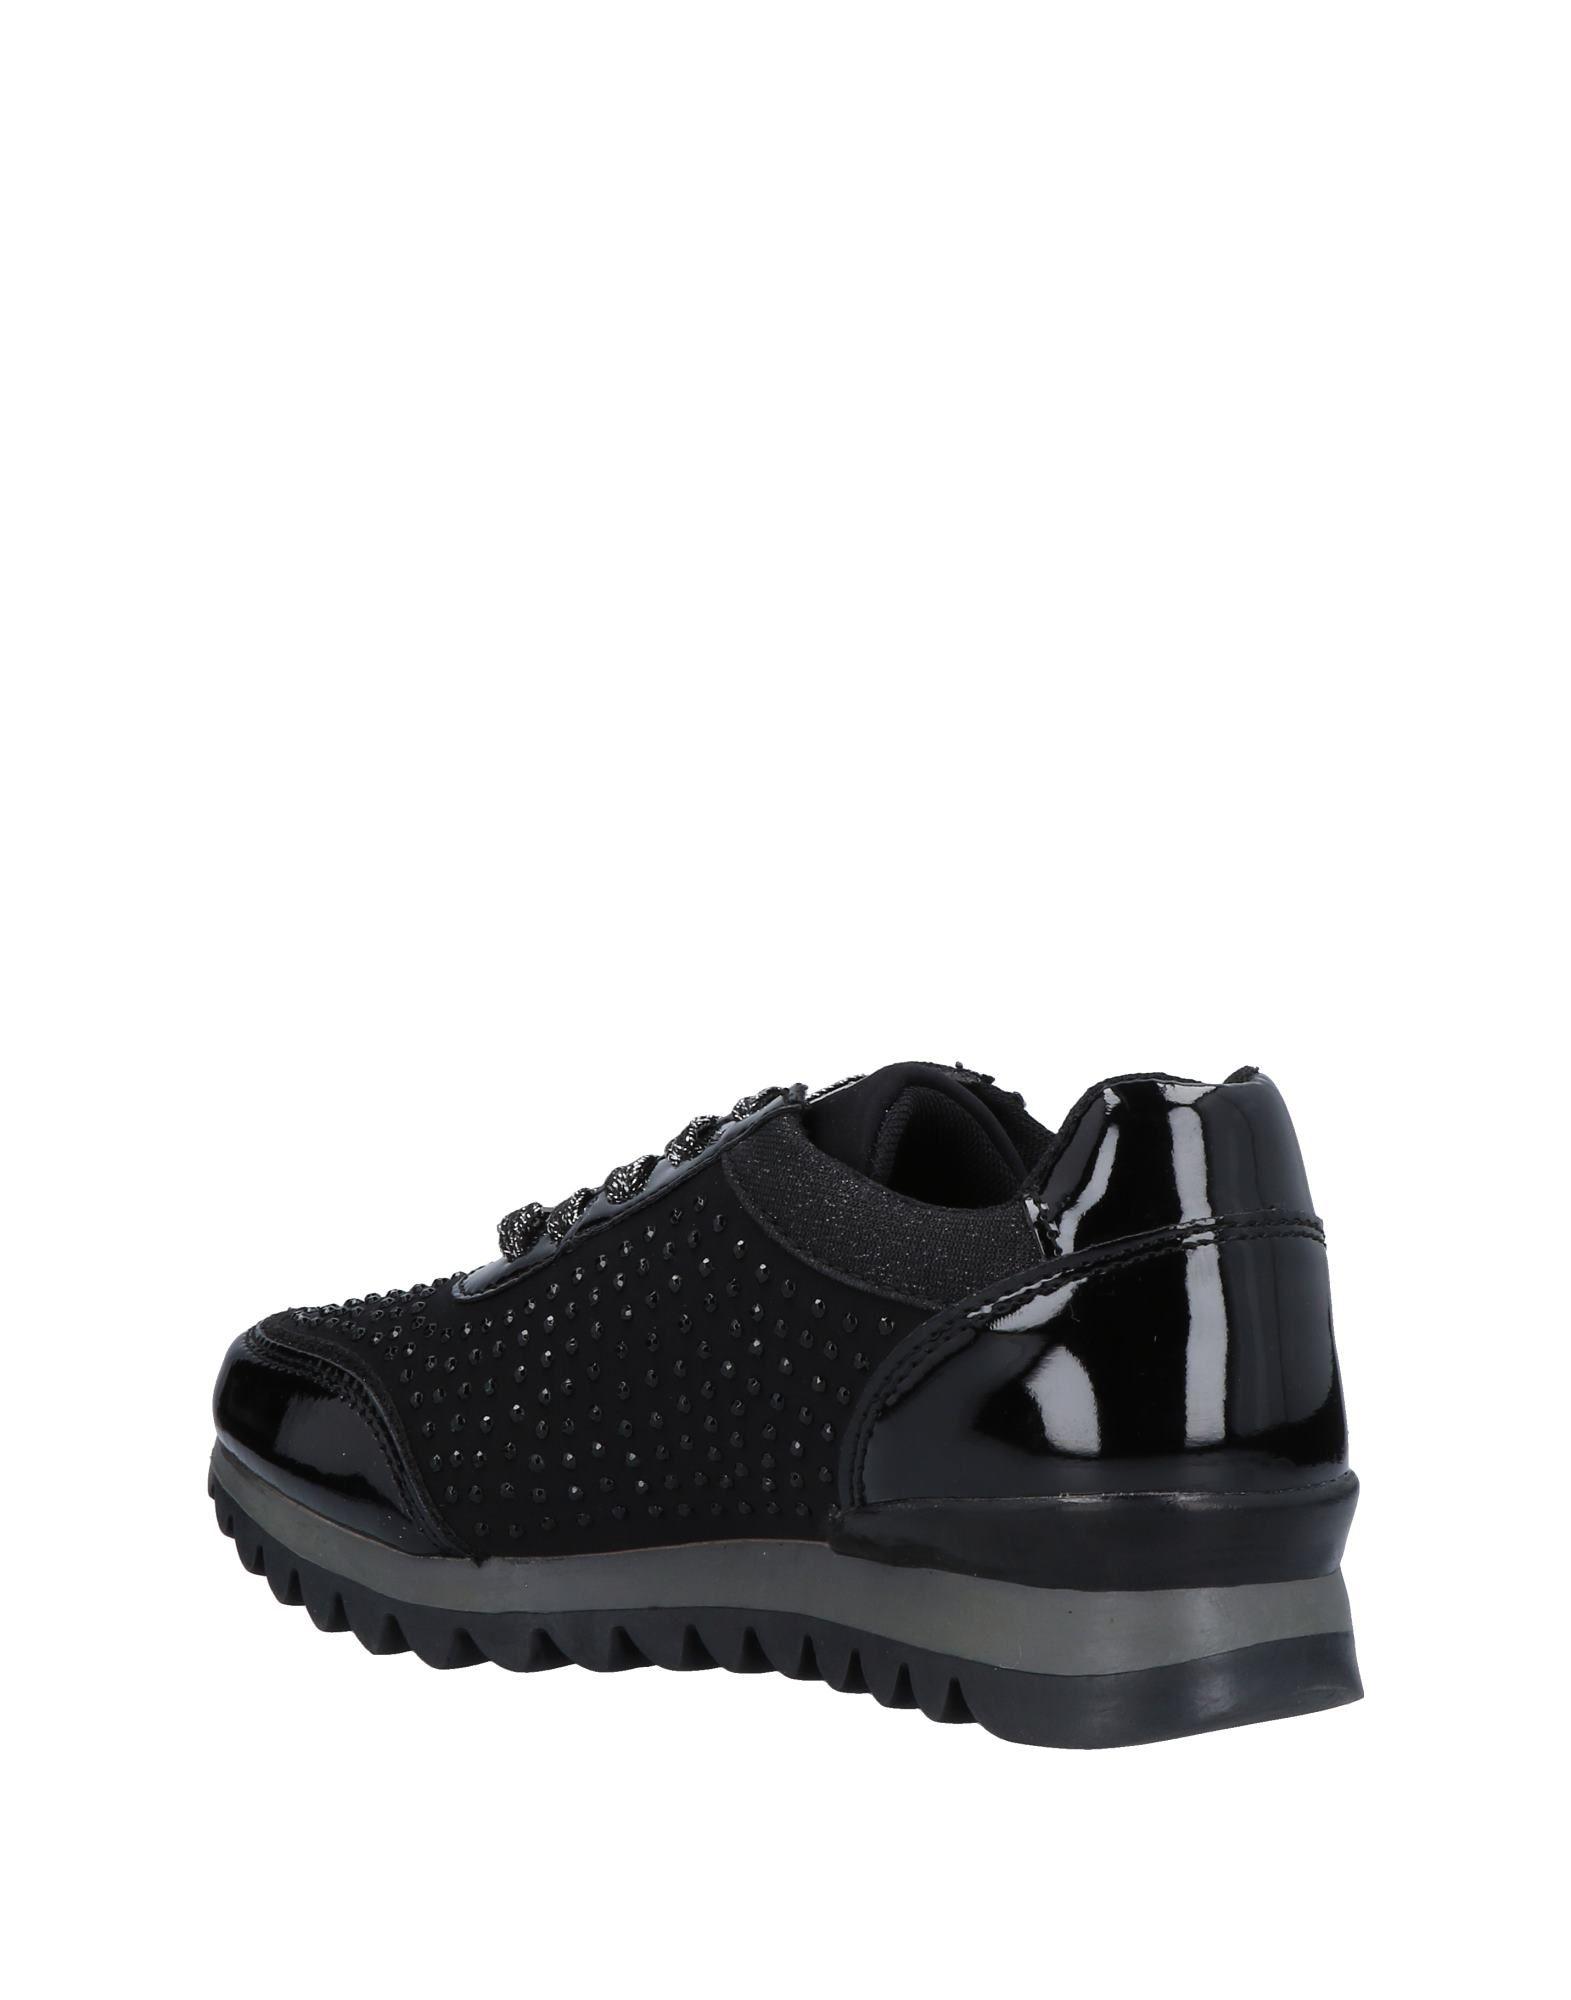 Laura Biagiotti Sneakers Damen Gute  11504556NX Gute Damen Qualität beliebte Schuhe e48a45